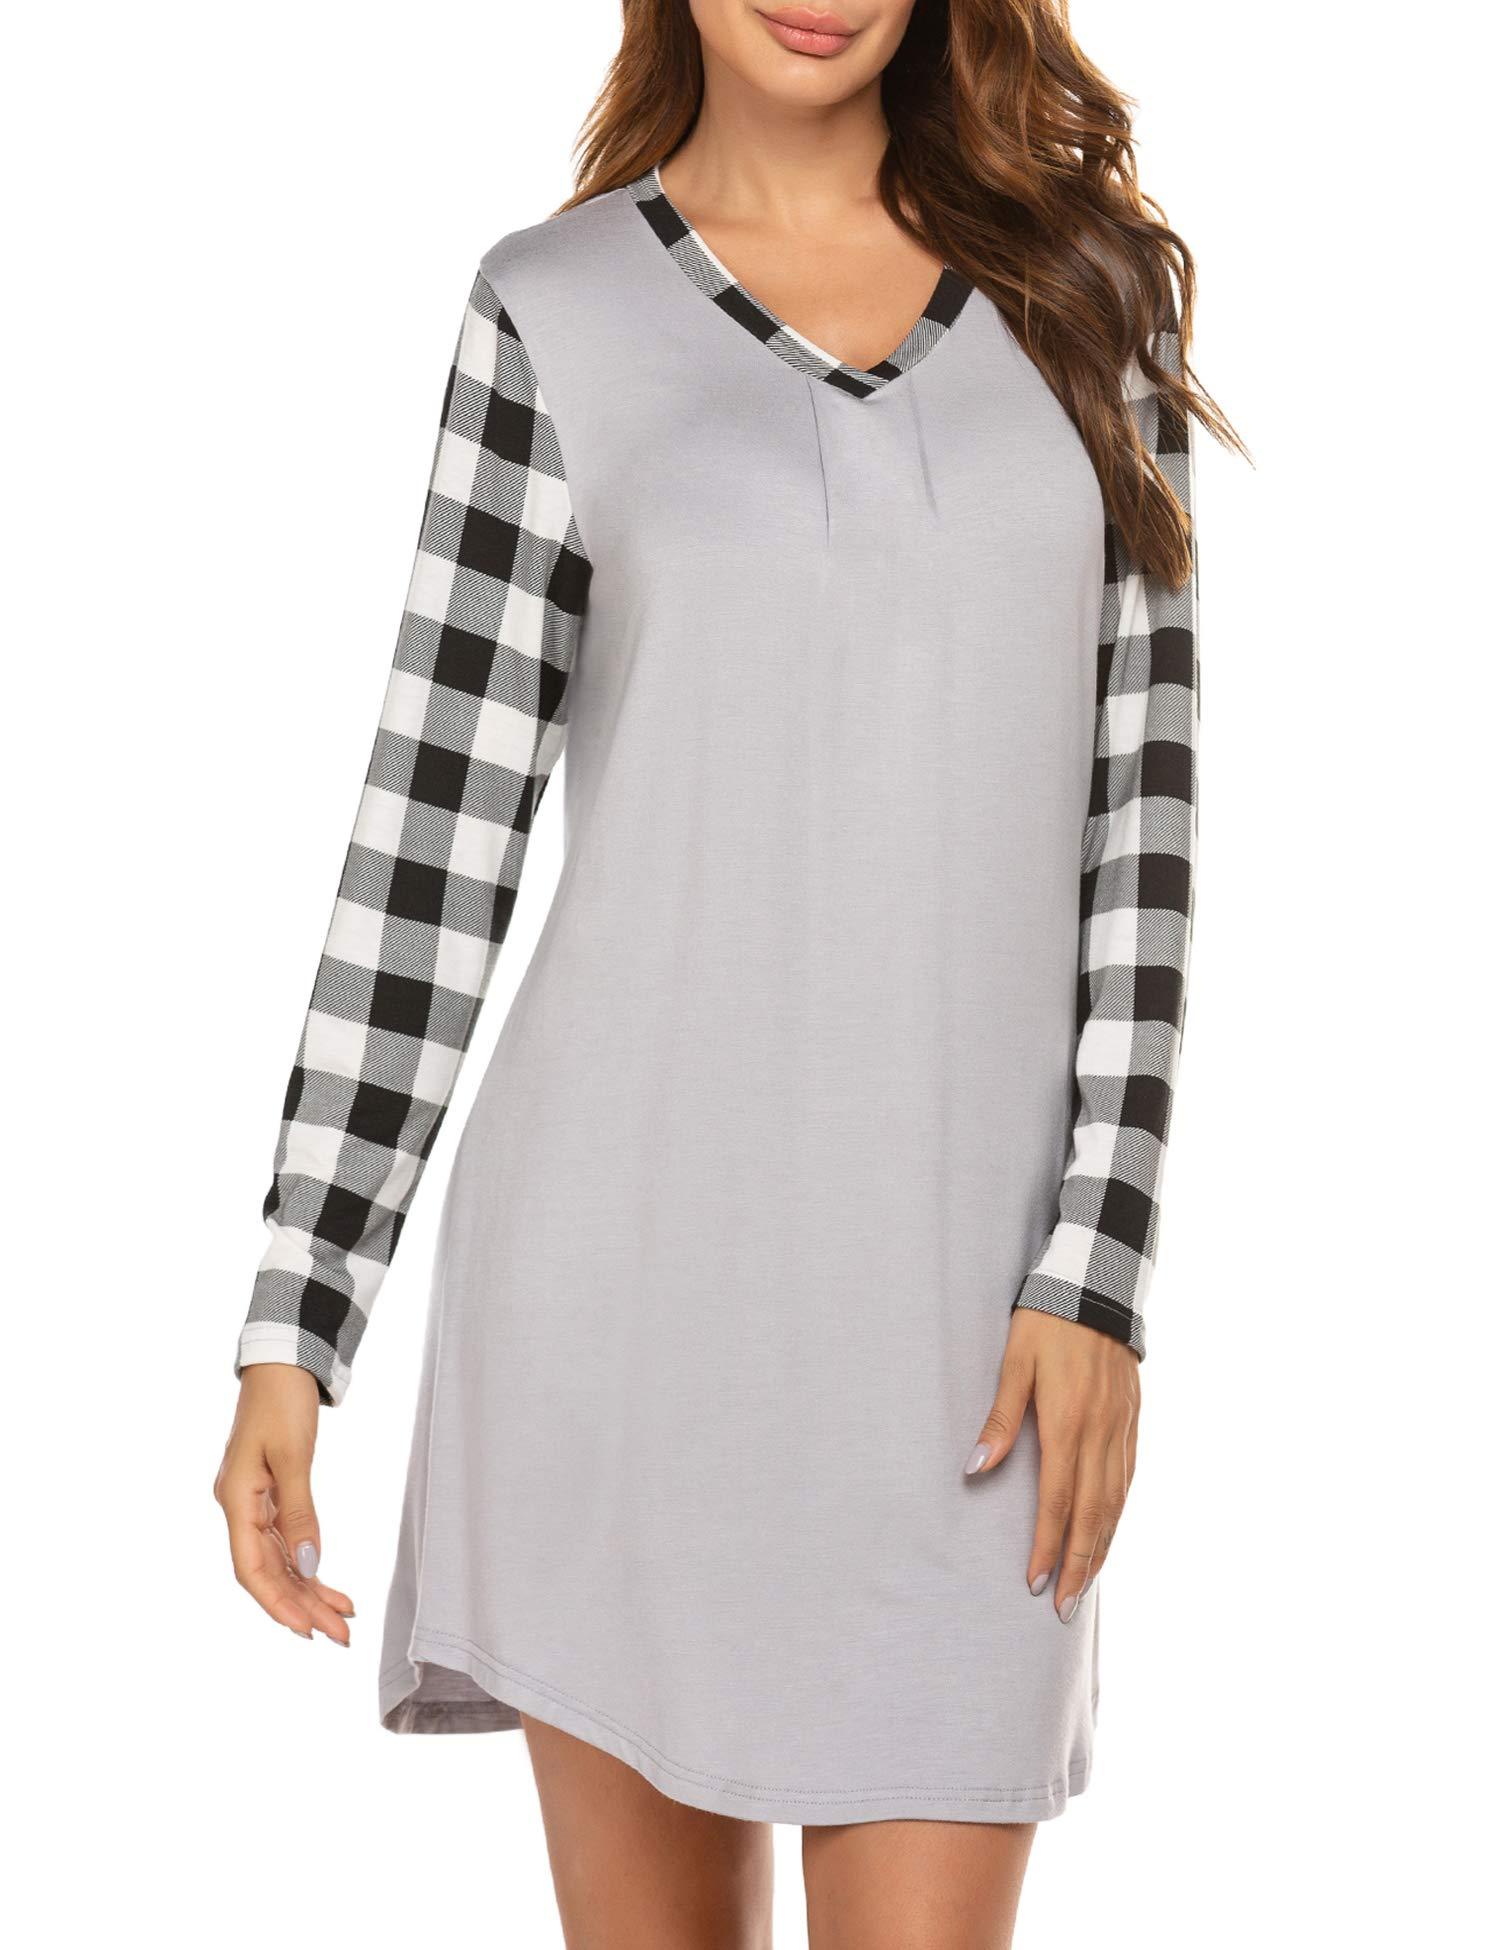 Ekouaer Sleepwear Women's Nightgown V Neck Long Sleeve Soft Plaid Nightshirt Casual Loungewear Sleep Shirt Dress